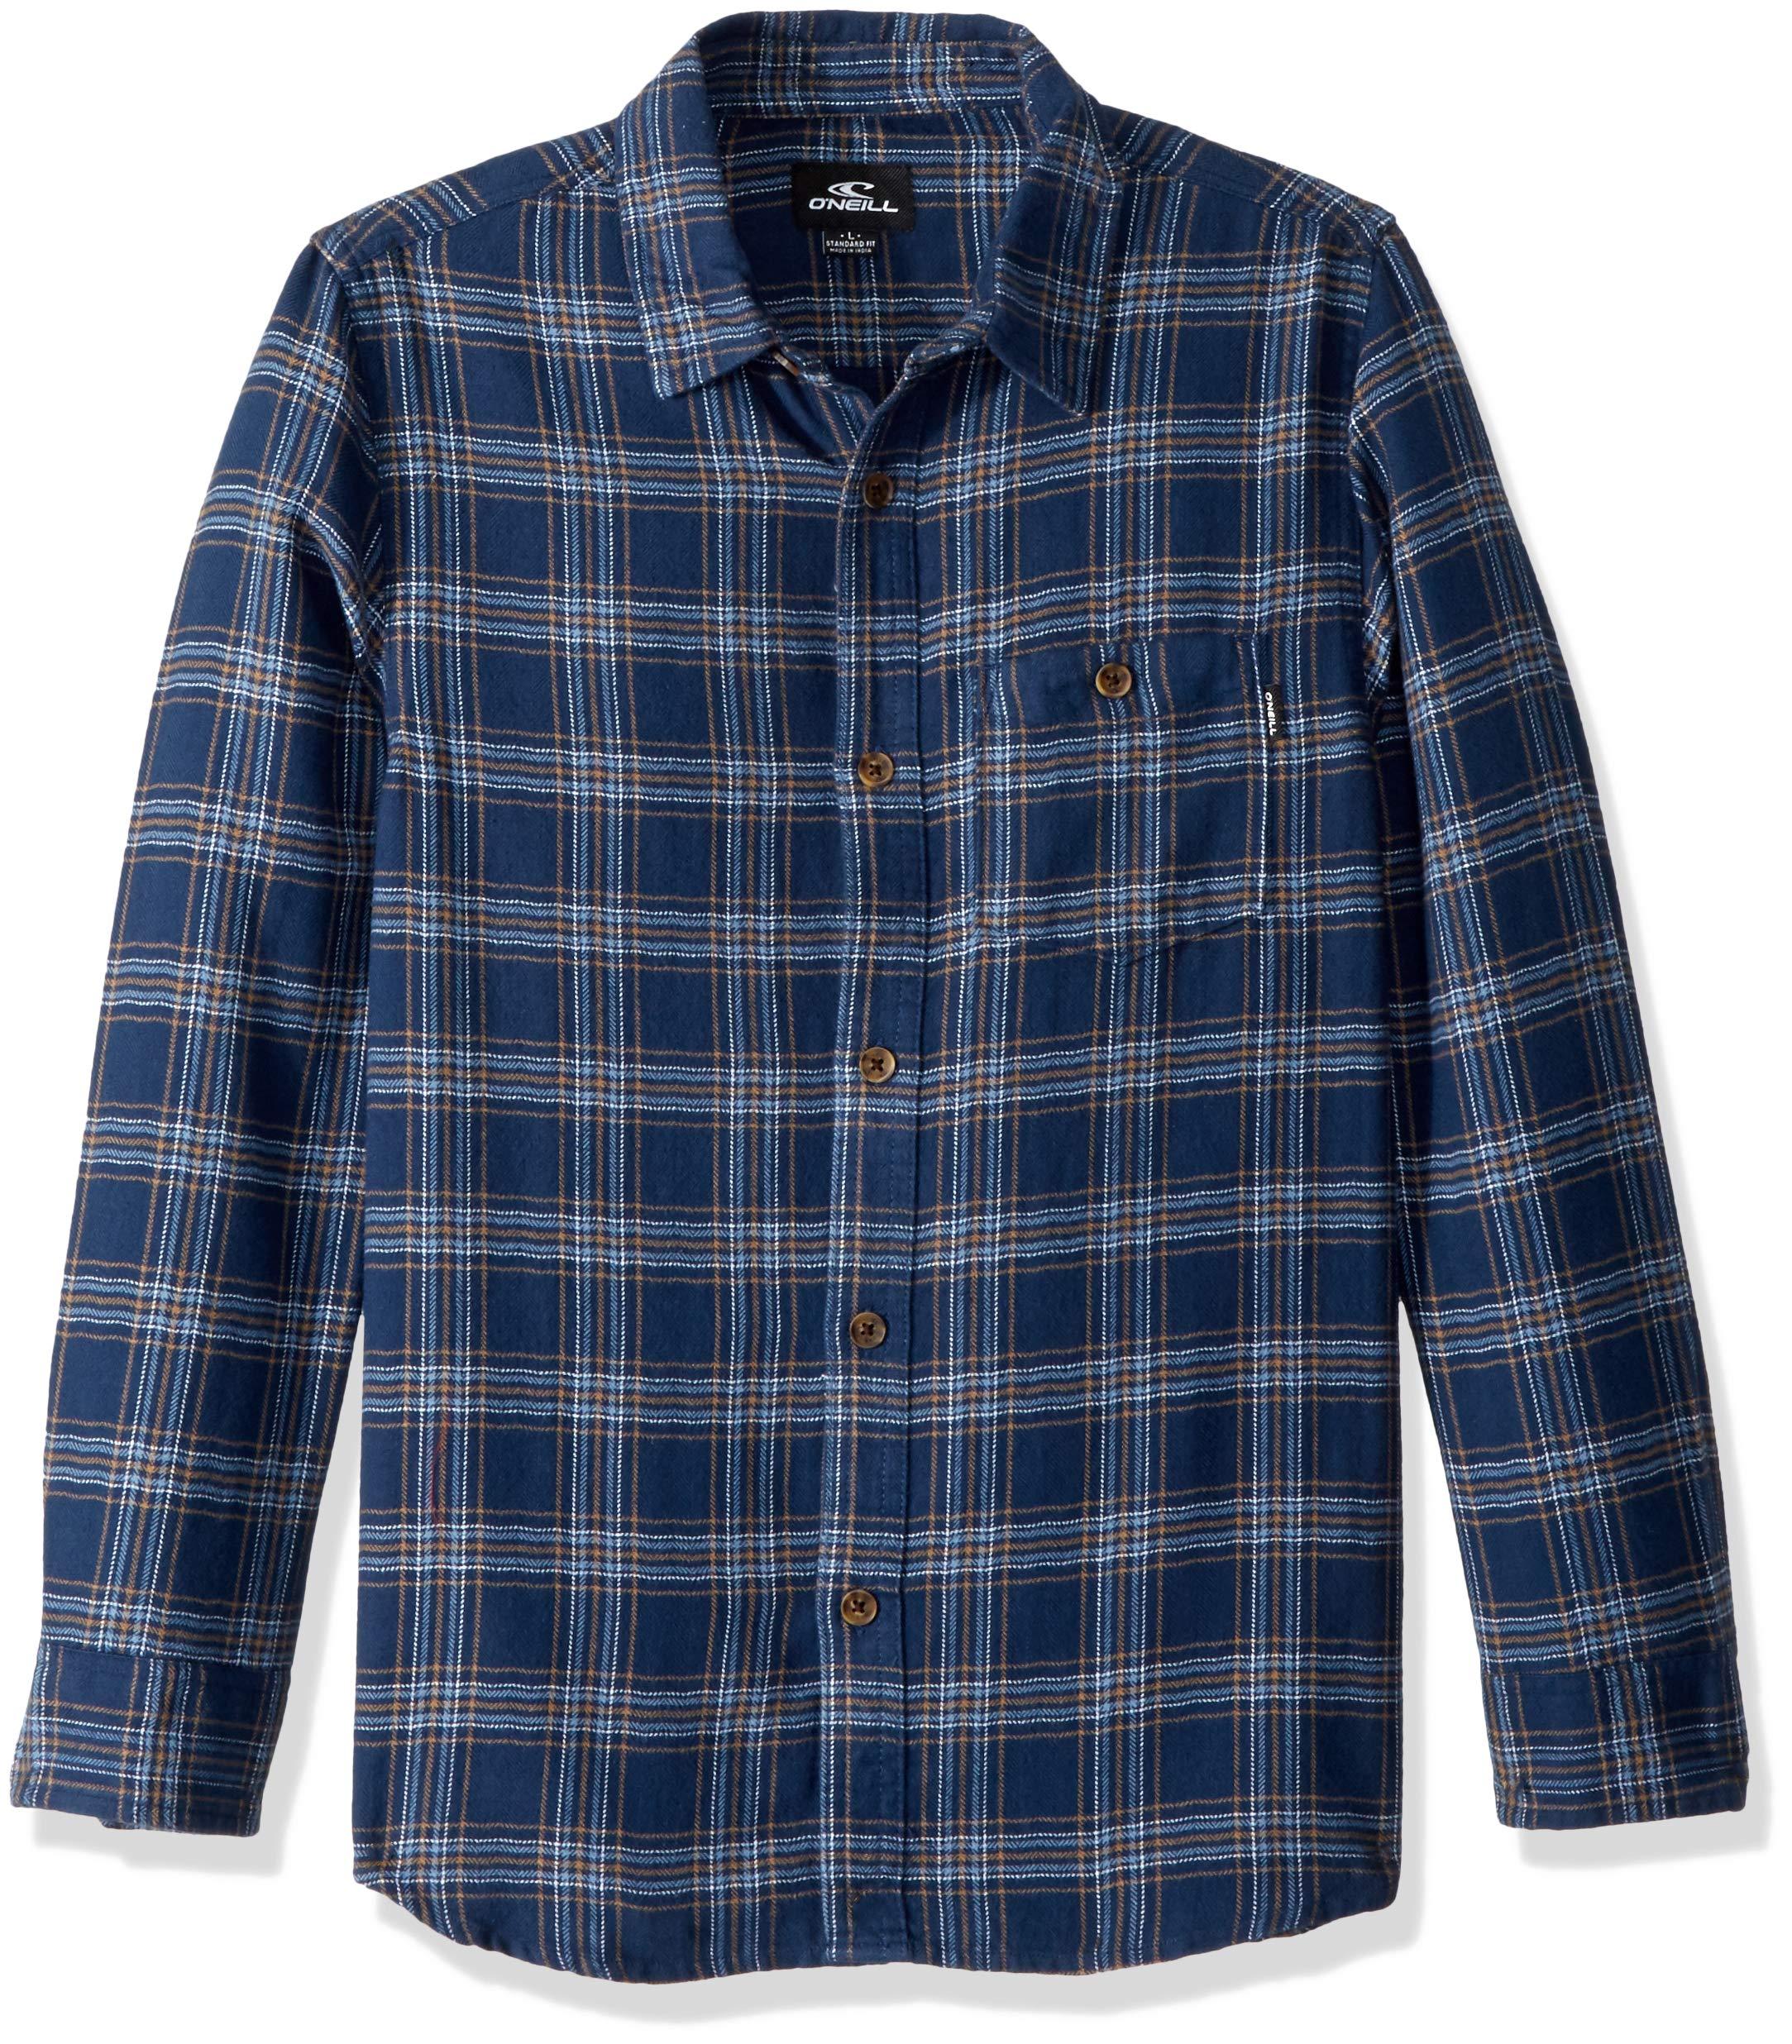 O'Neill Boys' Big Redmond Flannel, Navy, L